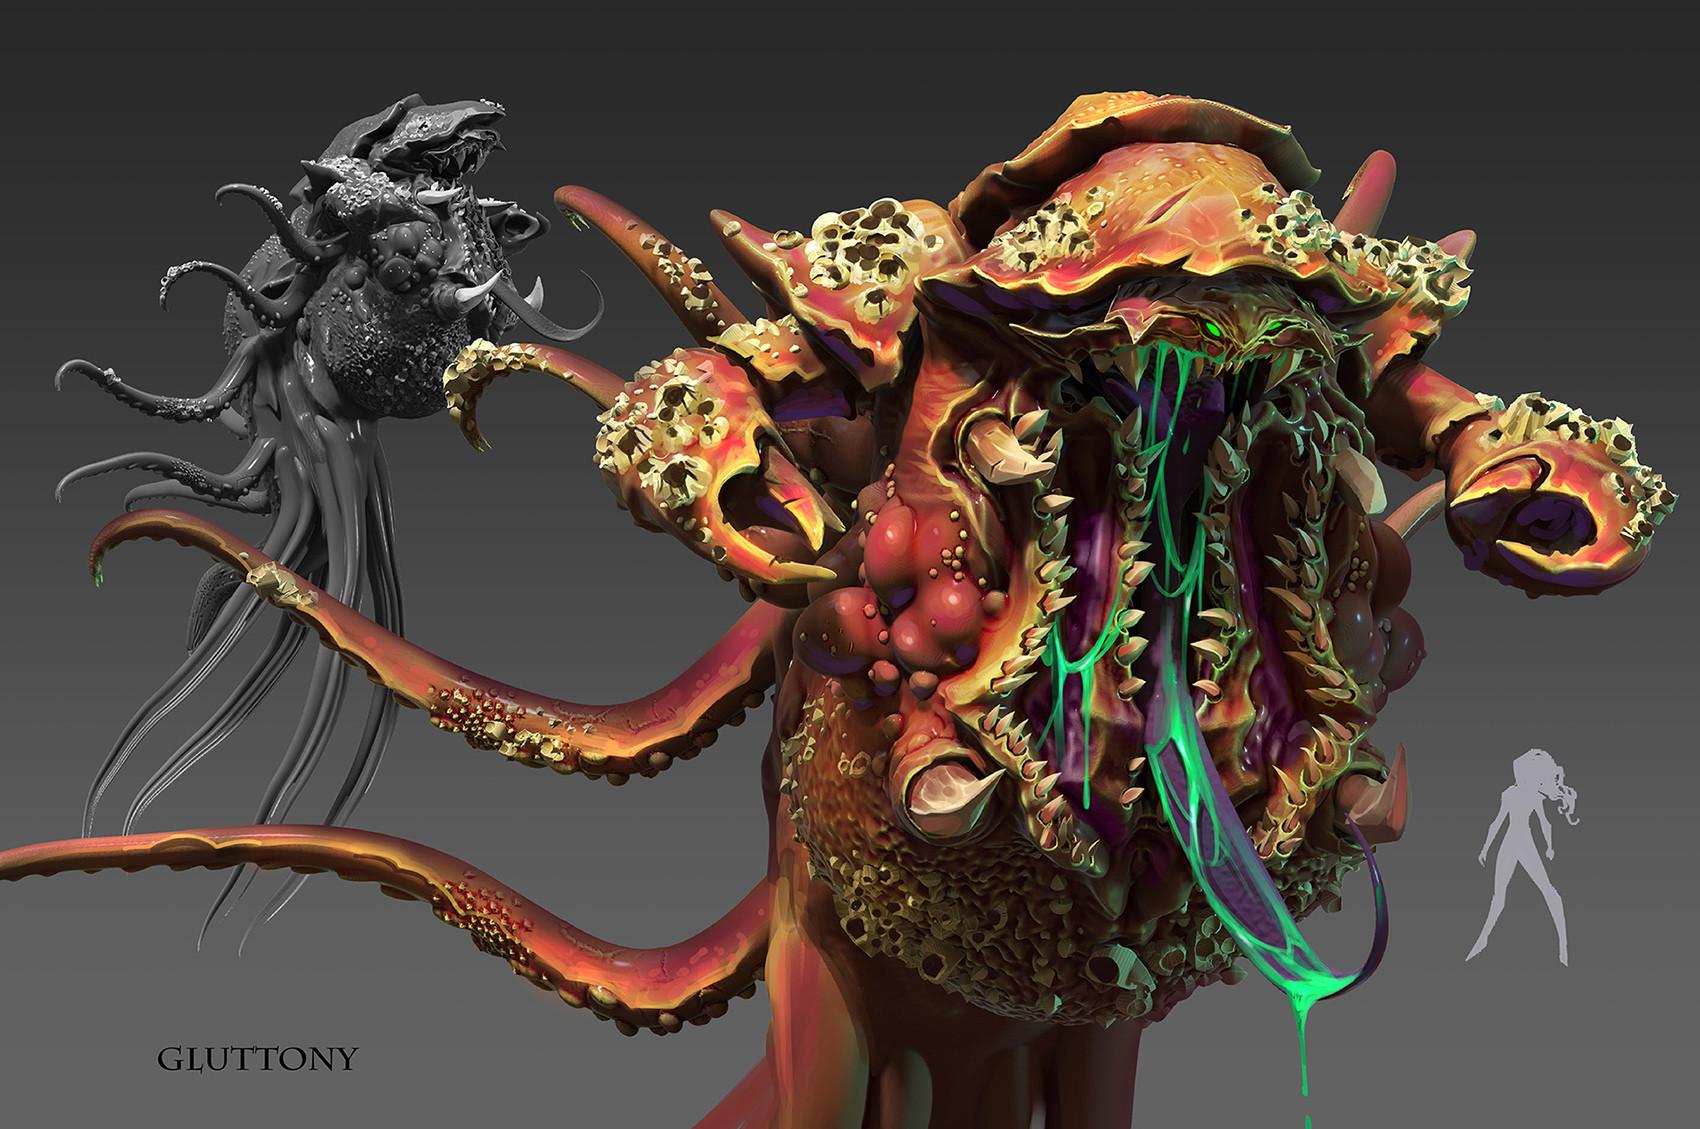 Daryl mandryk gluttony concept6